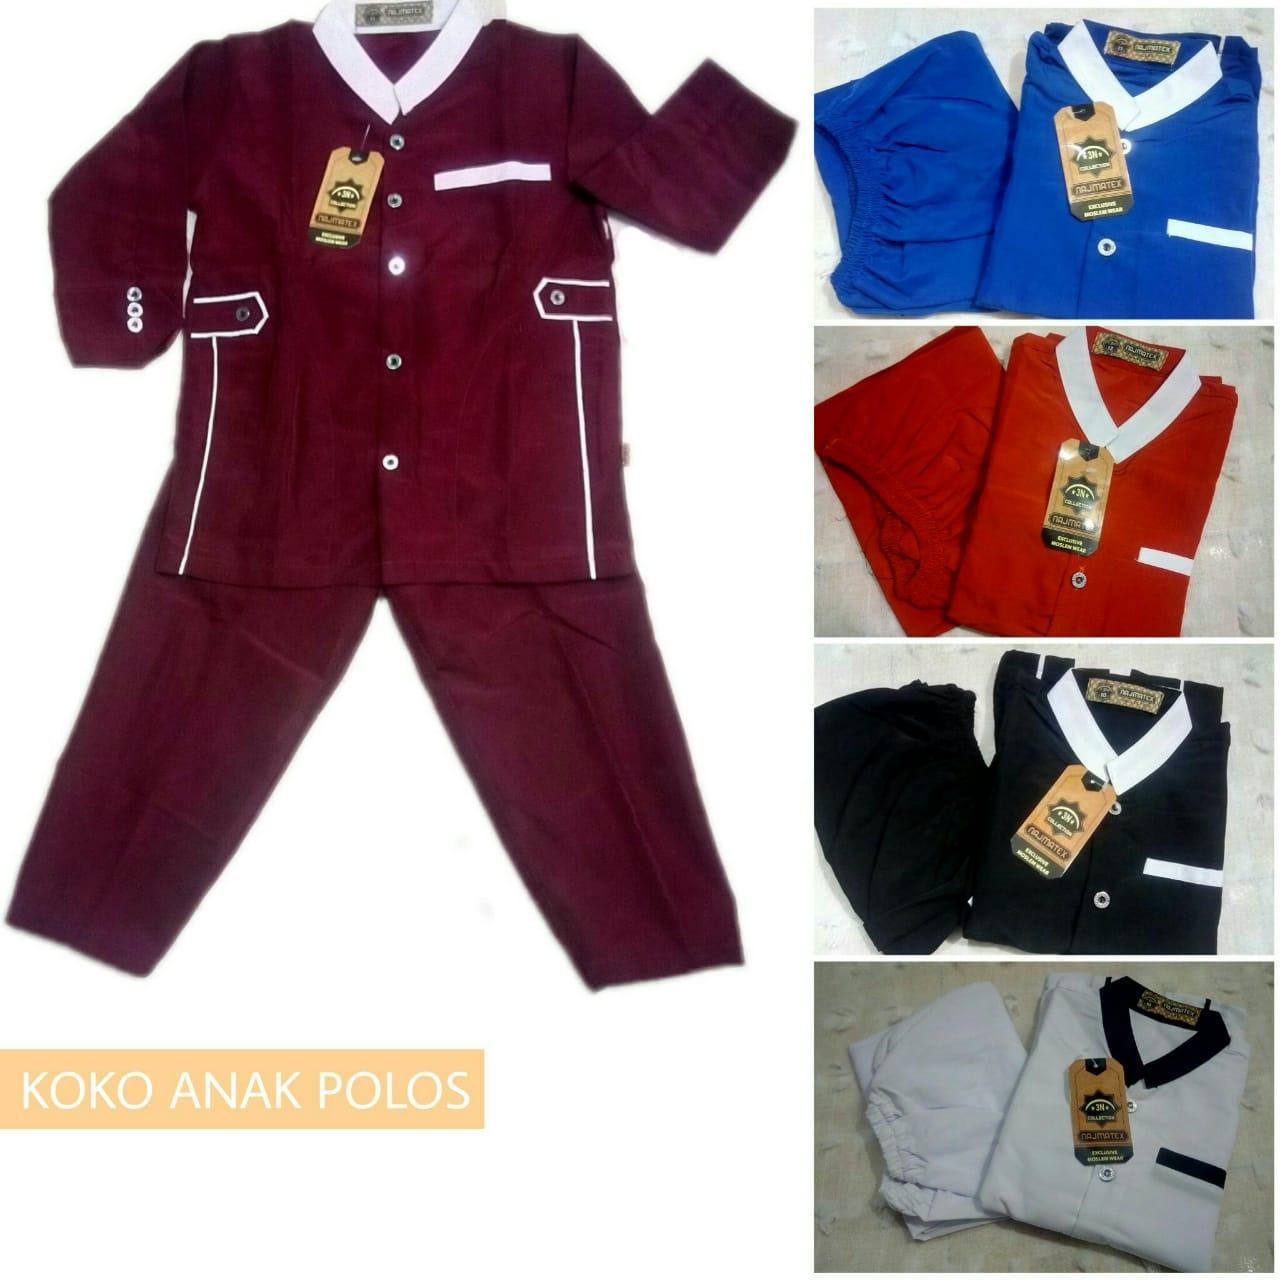 Pakaian Fashion Anak Laki Branded Collection Kaos Polo Setelan Cowok Baju